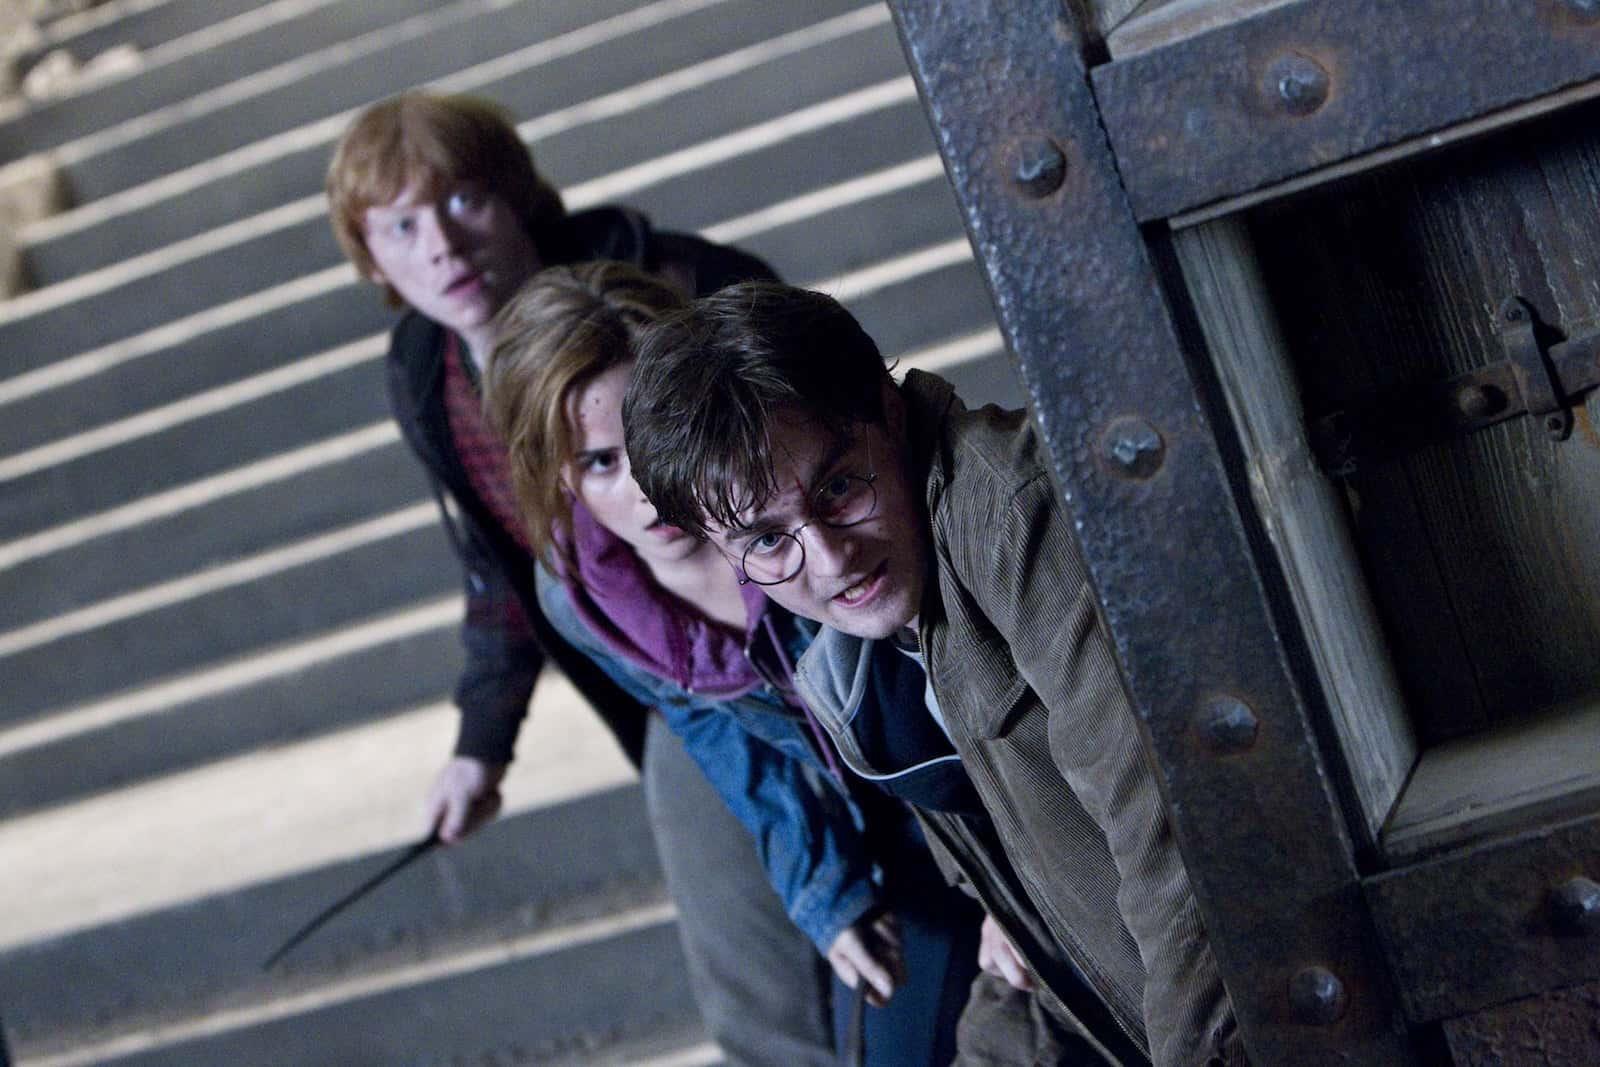 Dutch-Angle-Shots-Example-Dutch-Angle-Camera-Harry-Potter